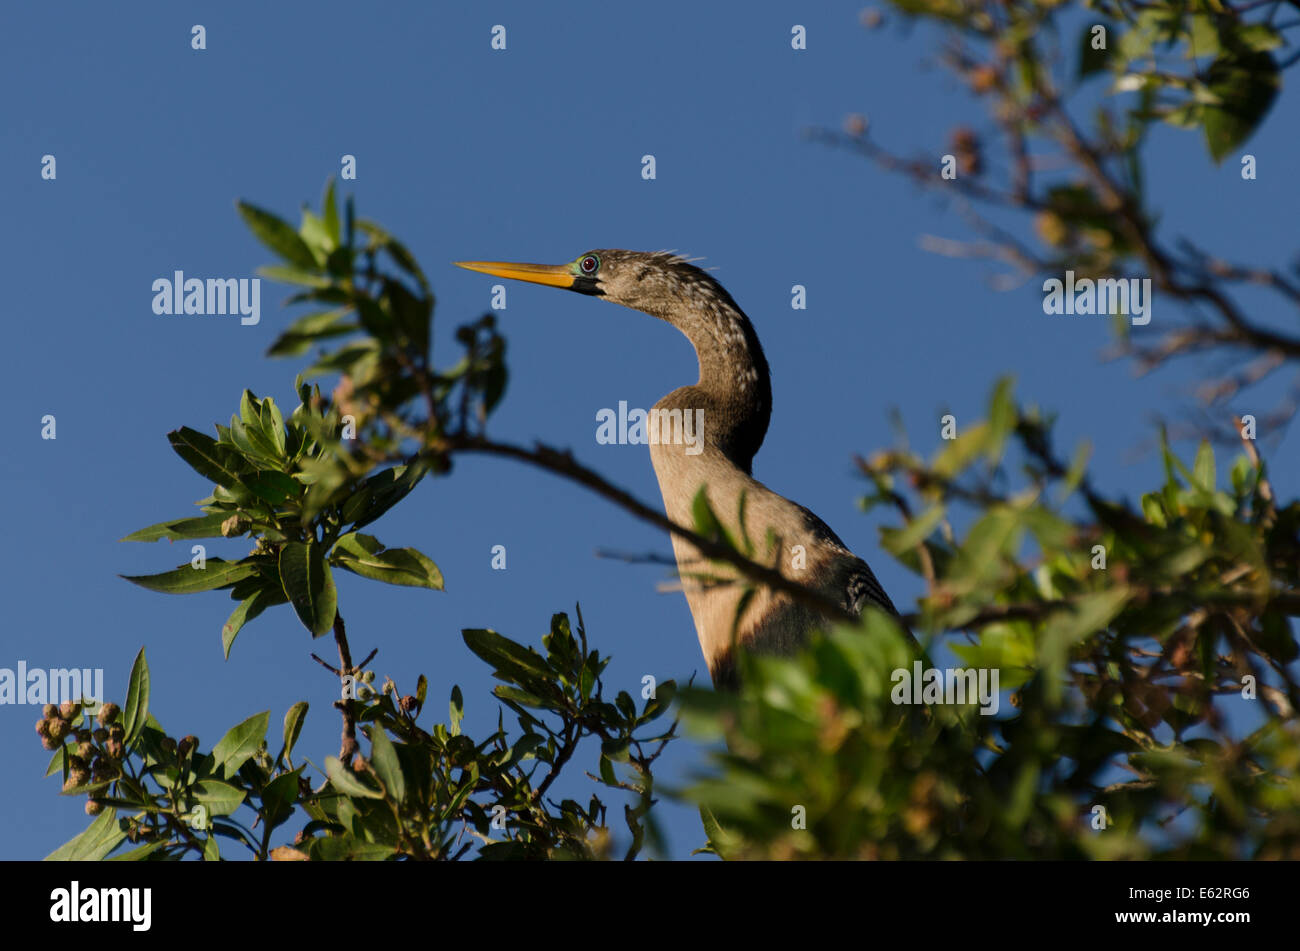 An Anhinga (Anhinga anhinga) female suns in a mango tree along the Pacific Coast of Central Mexico. - Stock Image